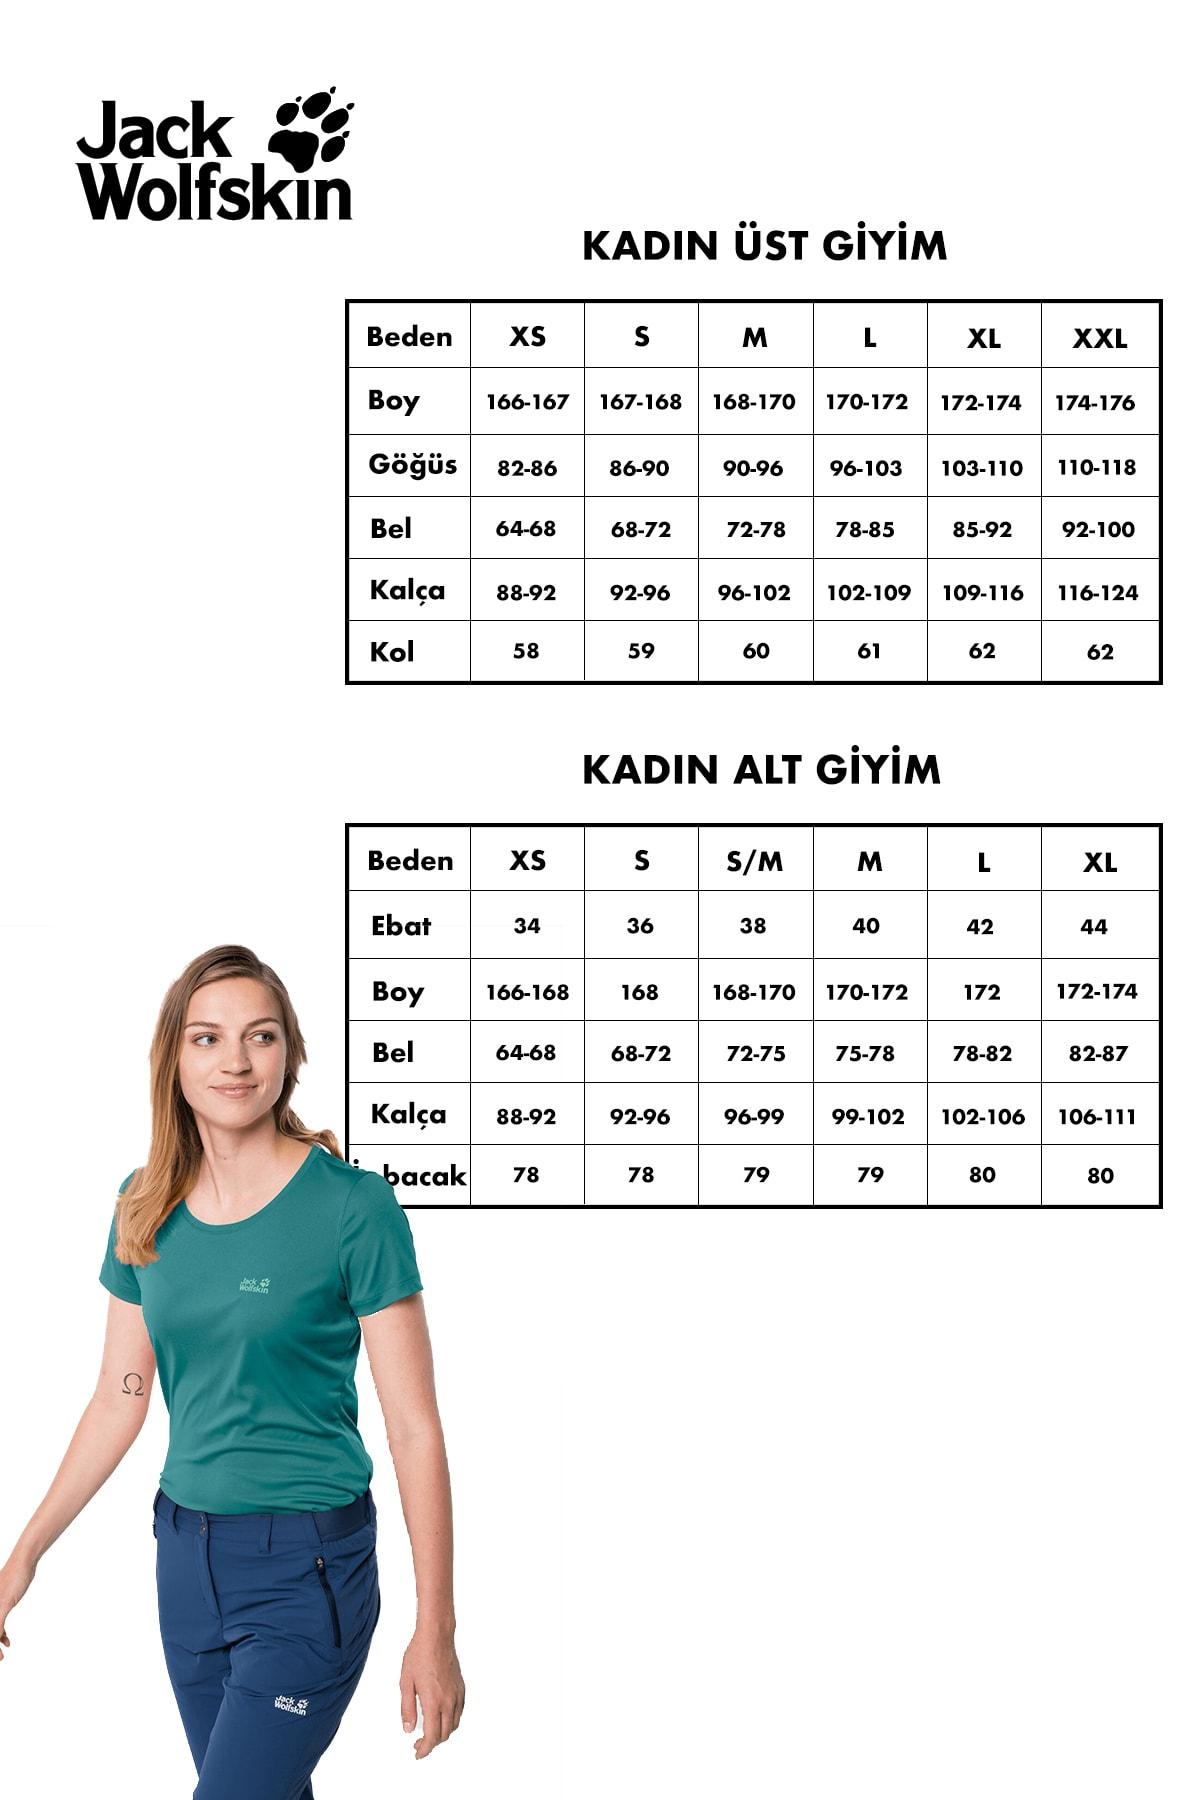 Jack Wolfskin Rock Chill Logo Kadın T-Shirt - 1805541-2058 2